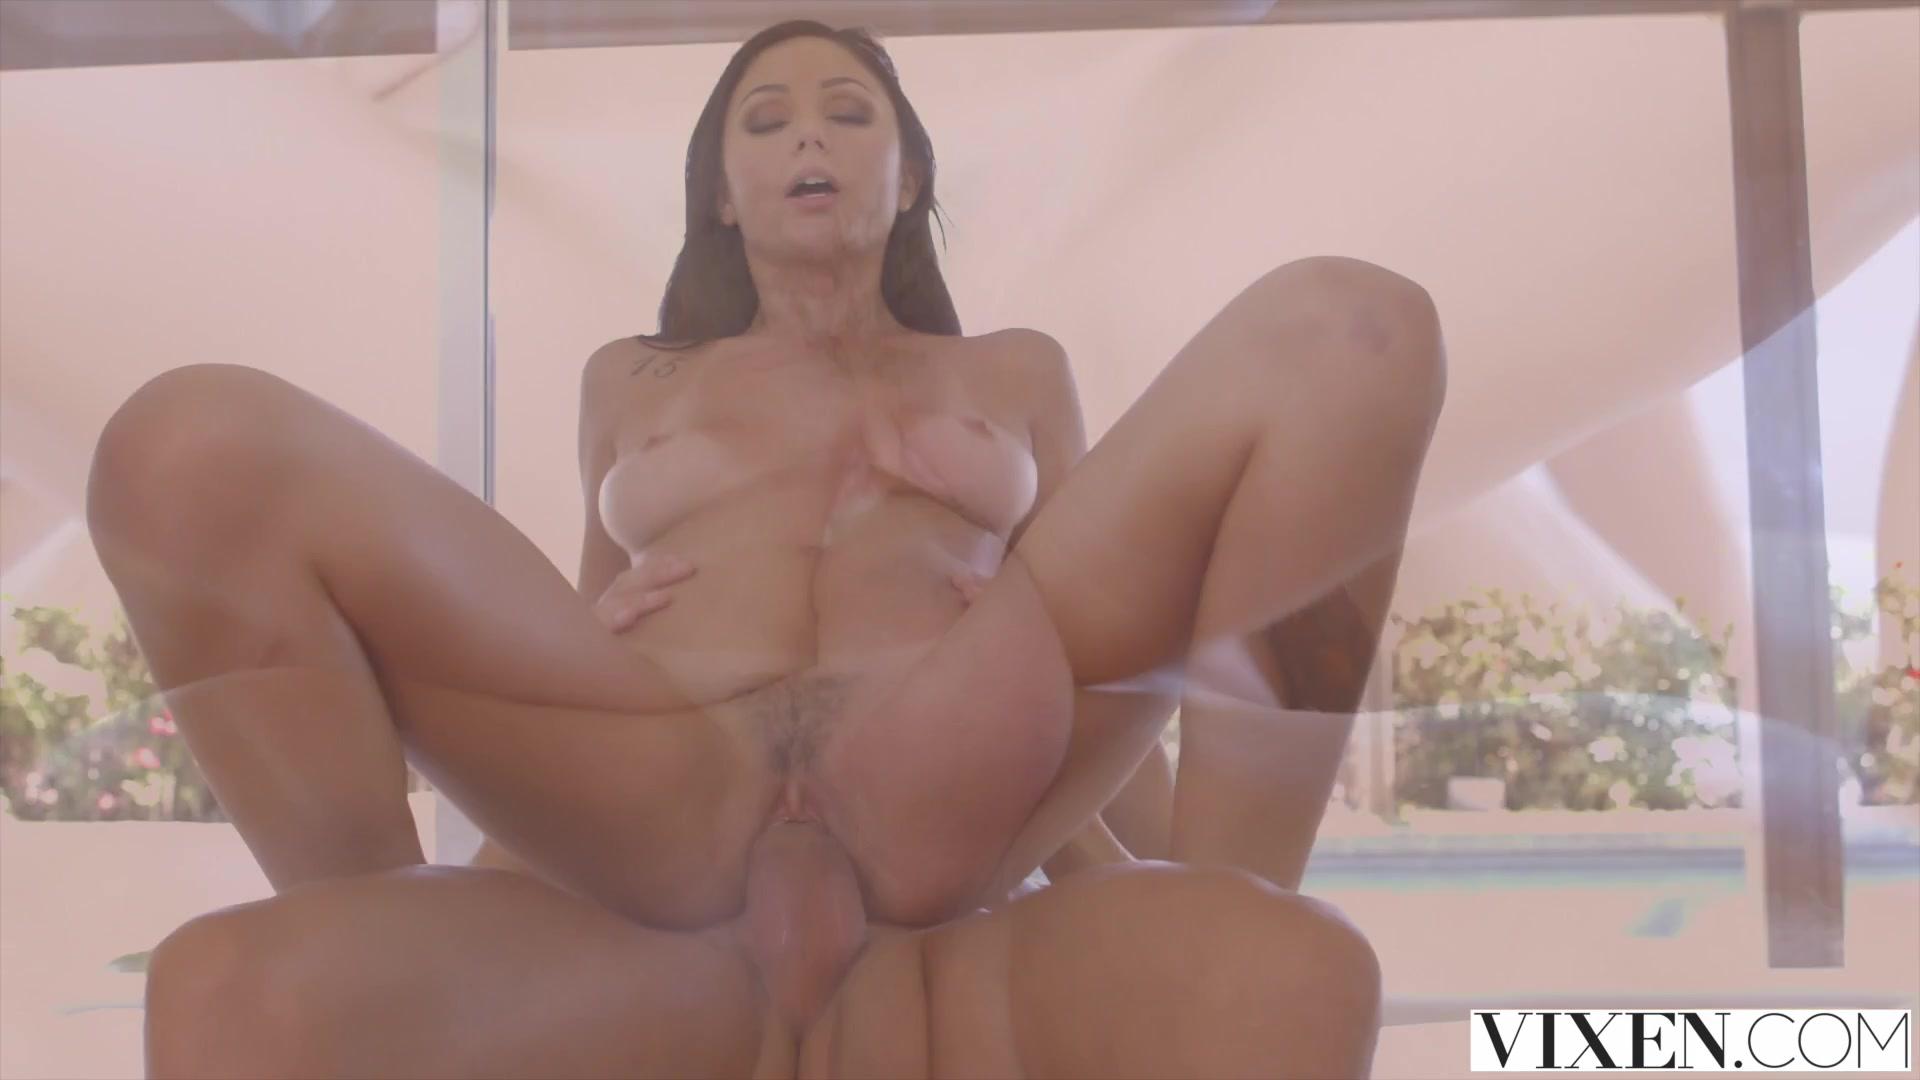 Good Video 18+ Carli banks glamour model